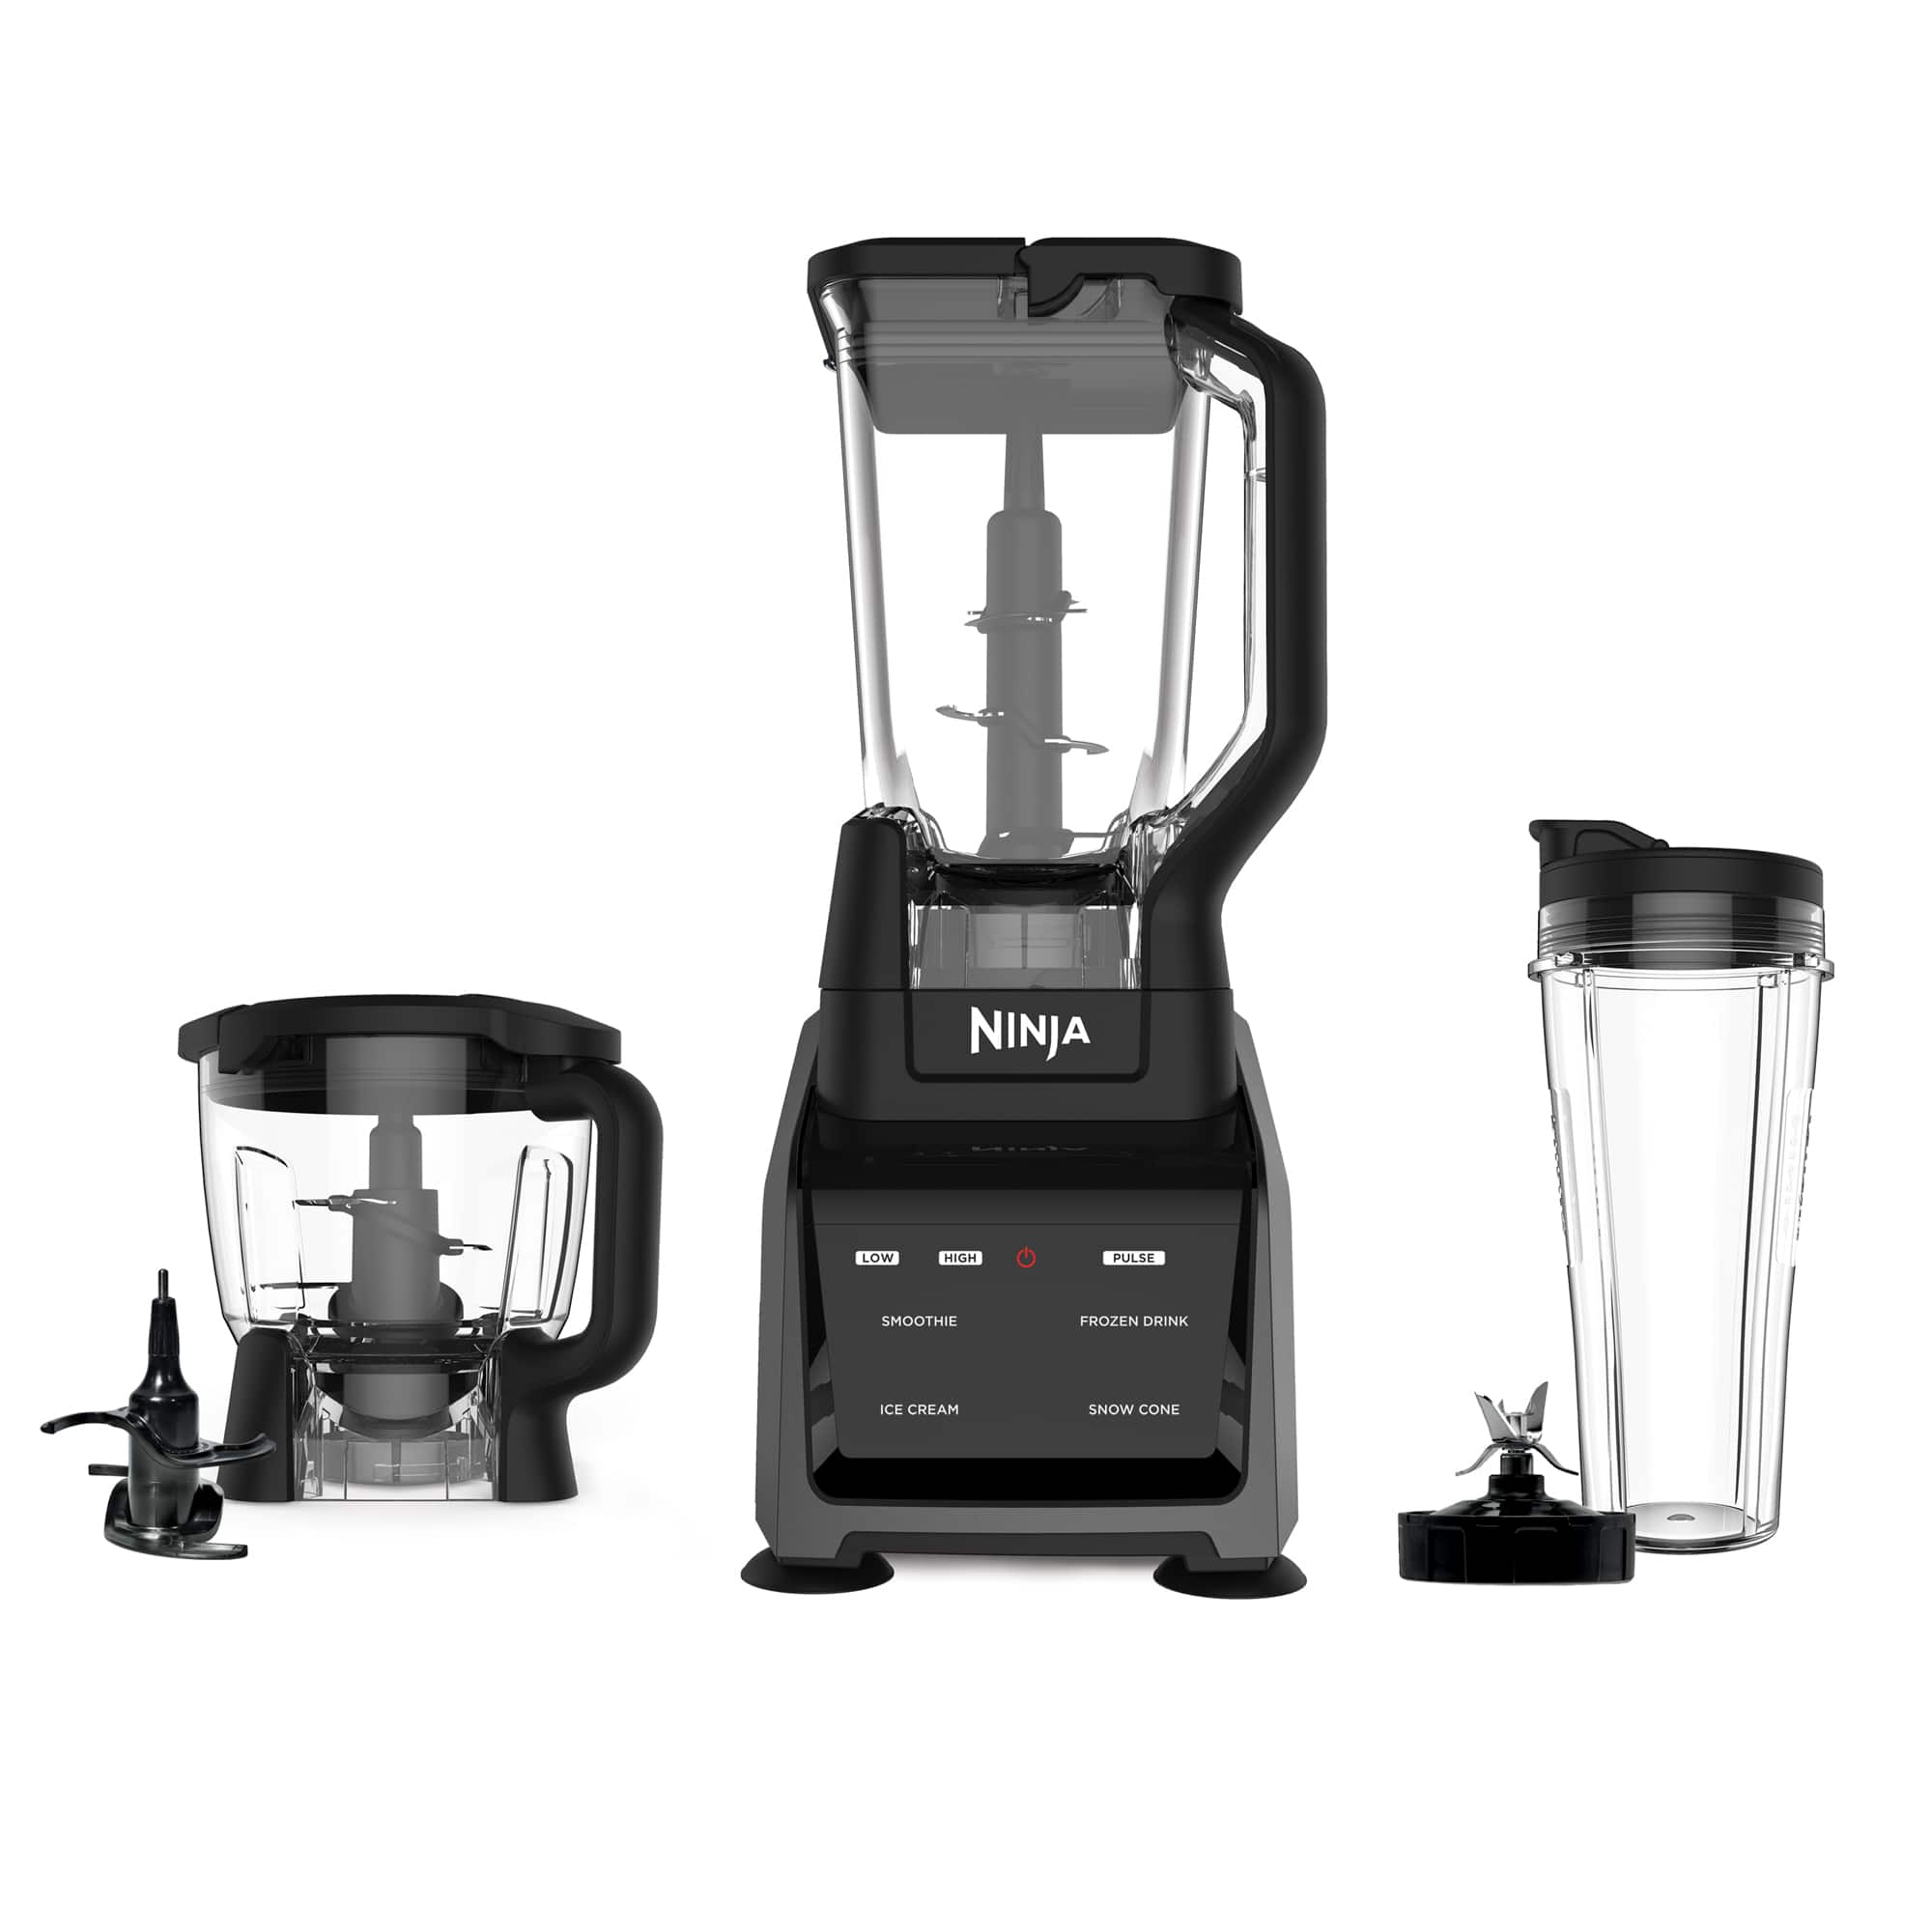 Ninja Intelli-Sense Kitchen System For $45 at Walmart YMMV